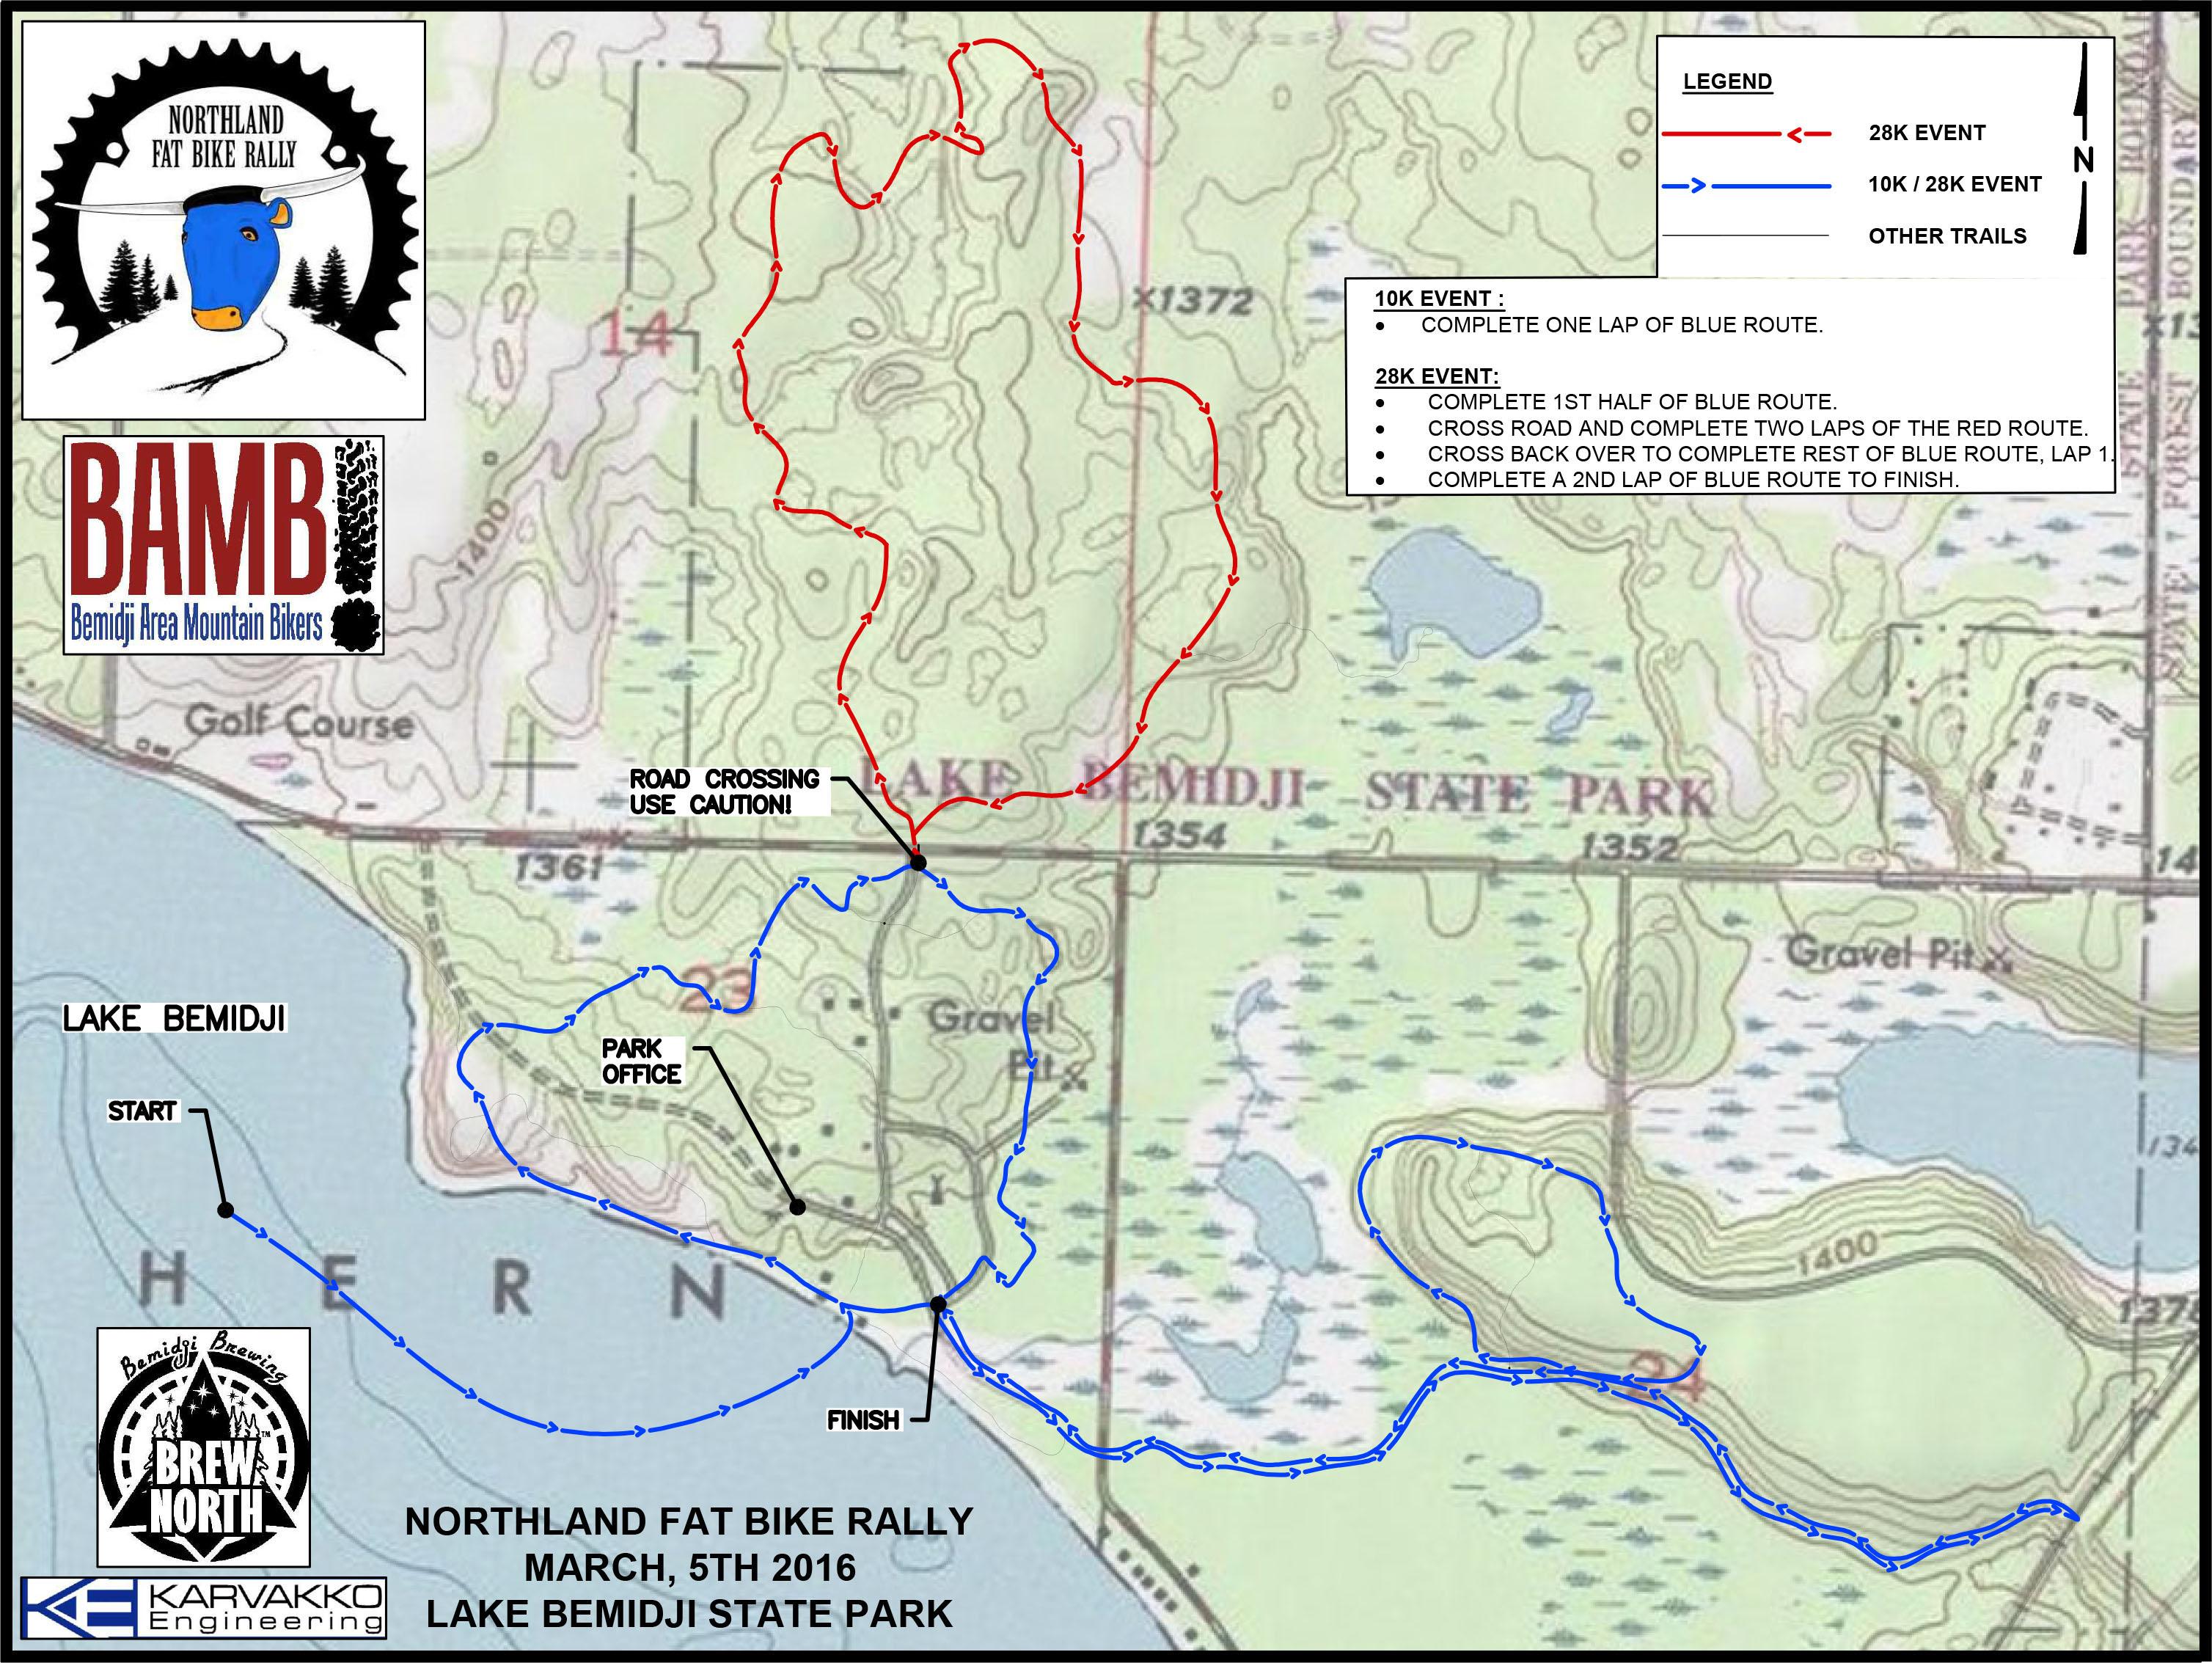 Northland Fat Bike rally map held at Lake Bemidji State Park.